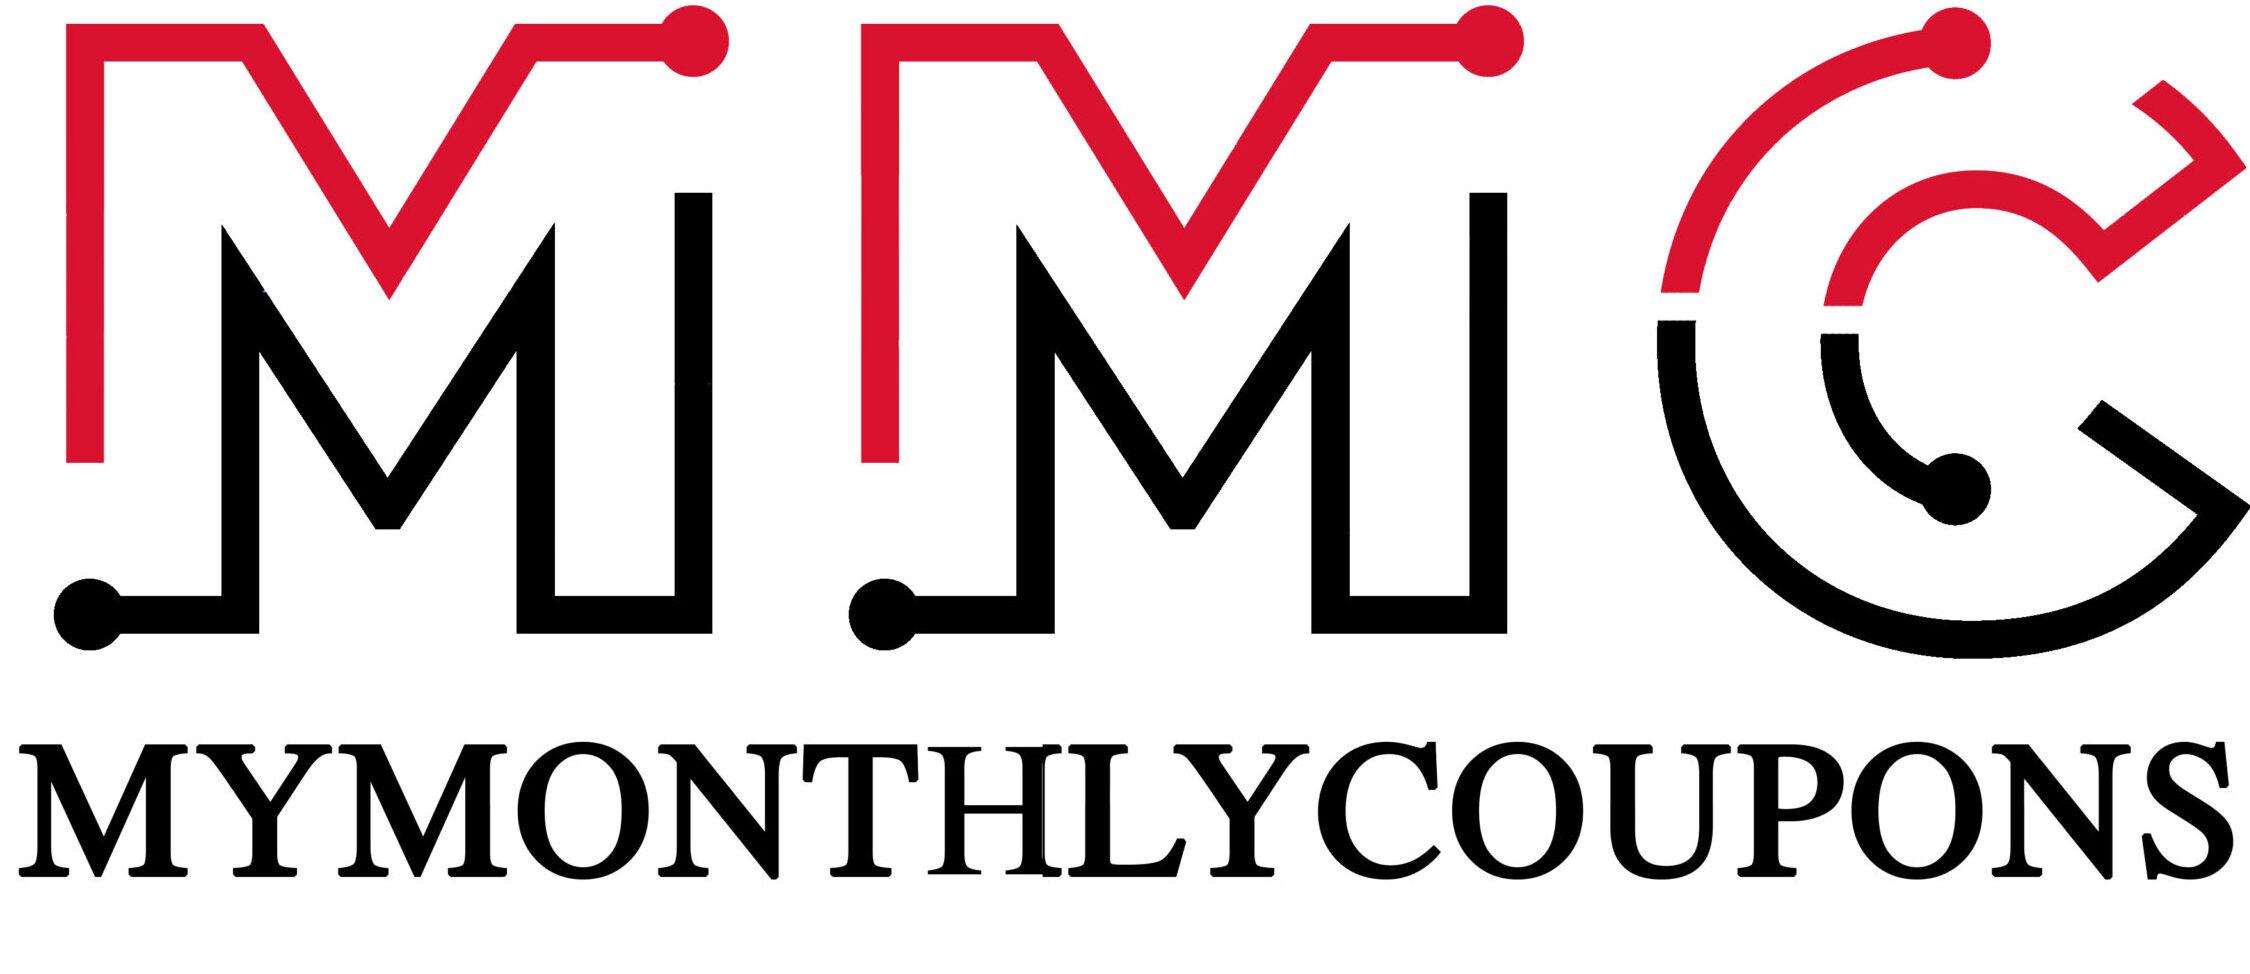 MyMonthlyCoupons